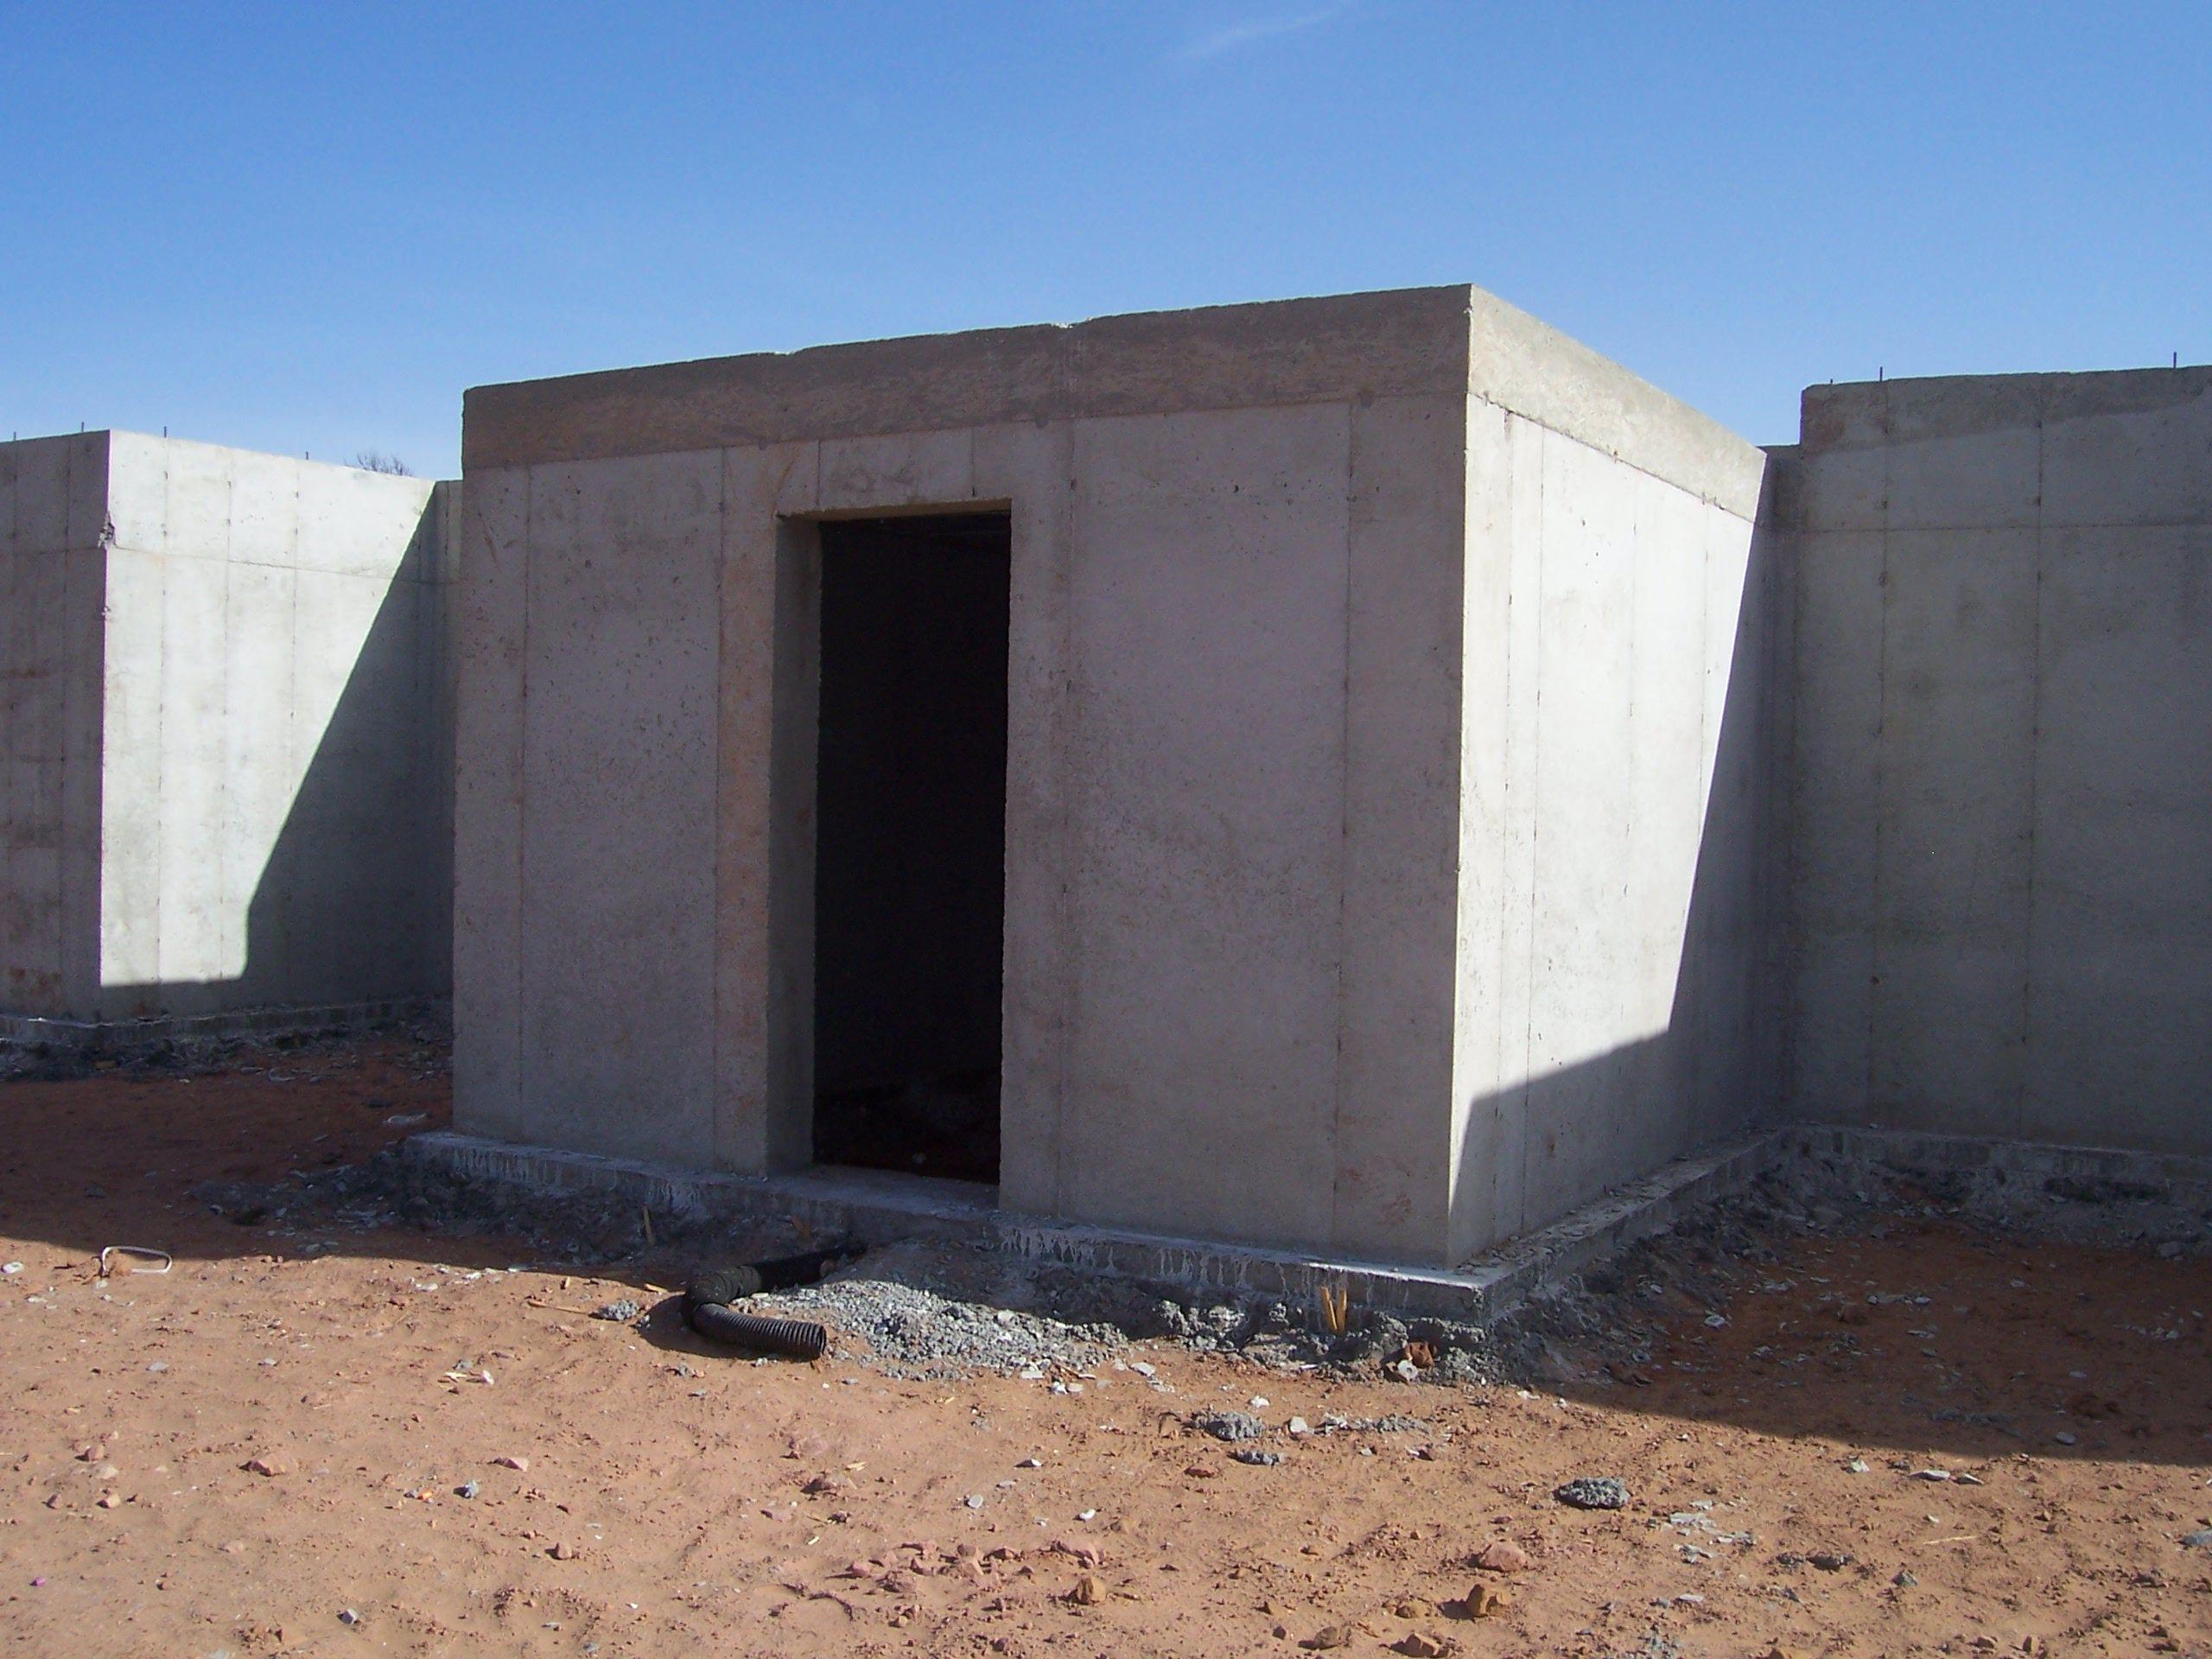 Cast In Place Tunnel Transition From Underground Foundation Concrete Block Walls Concrete Blocks Concrete